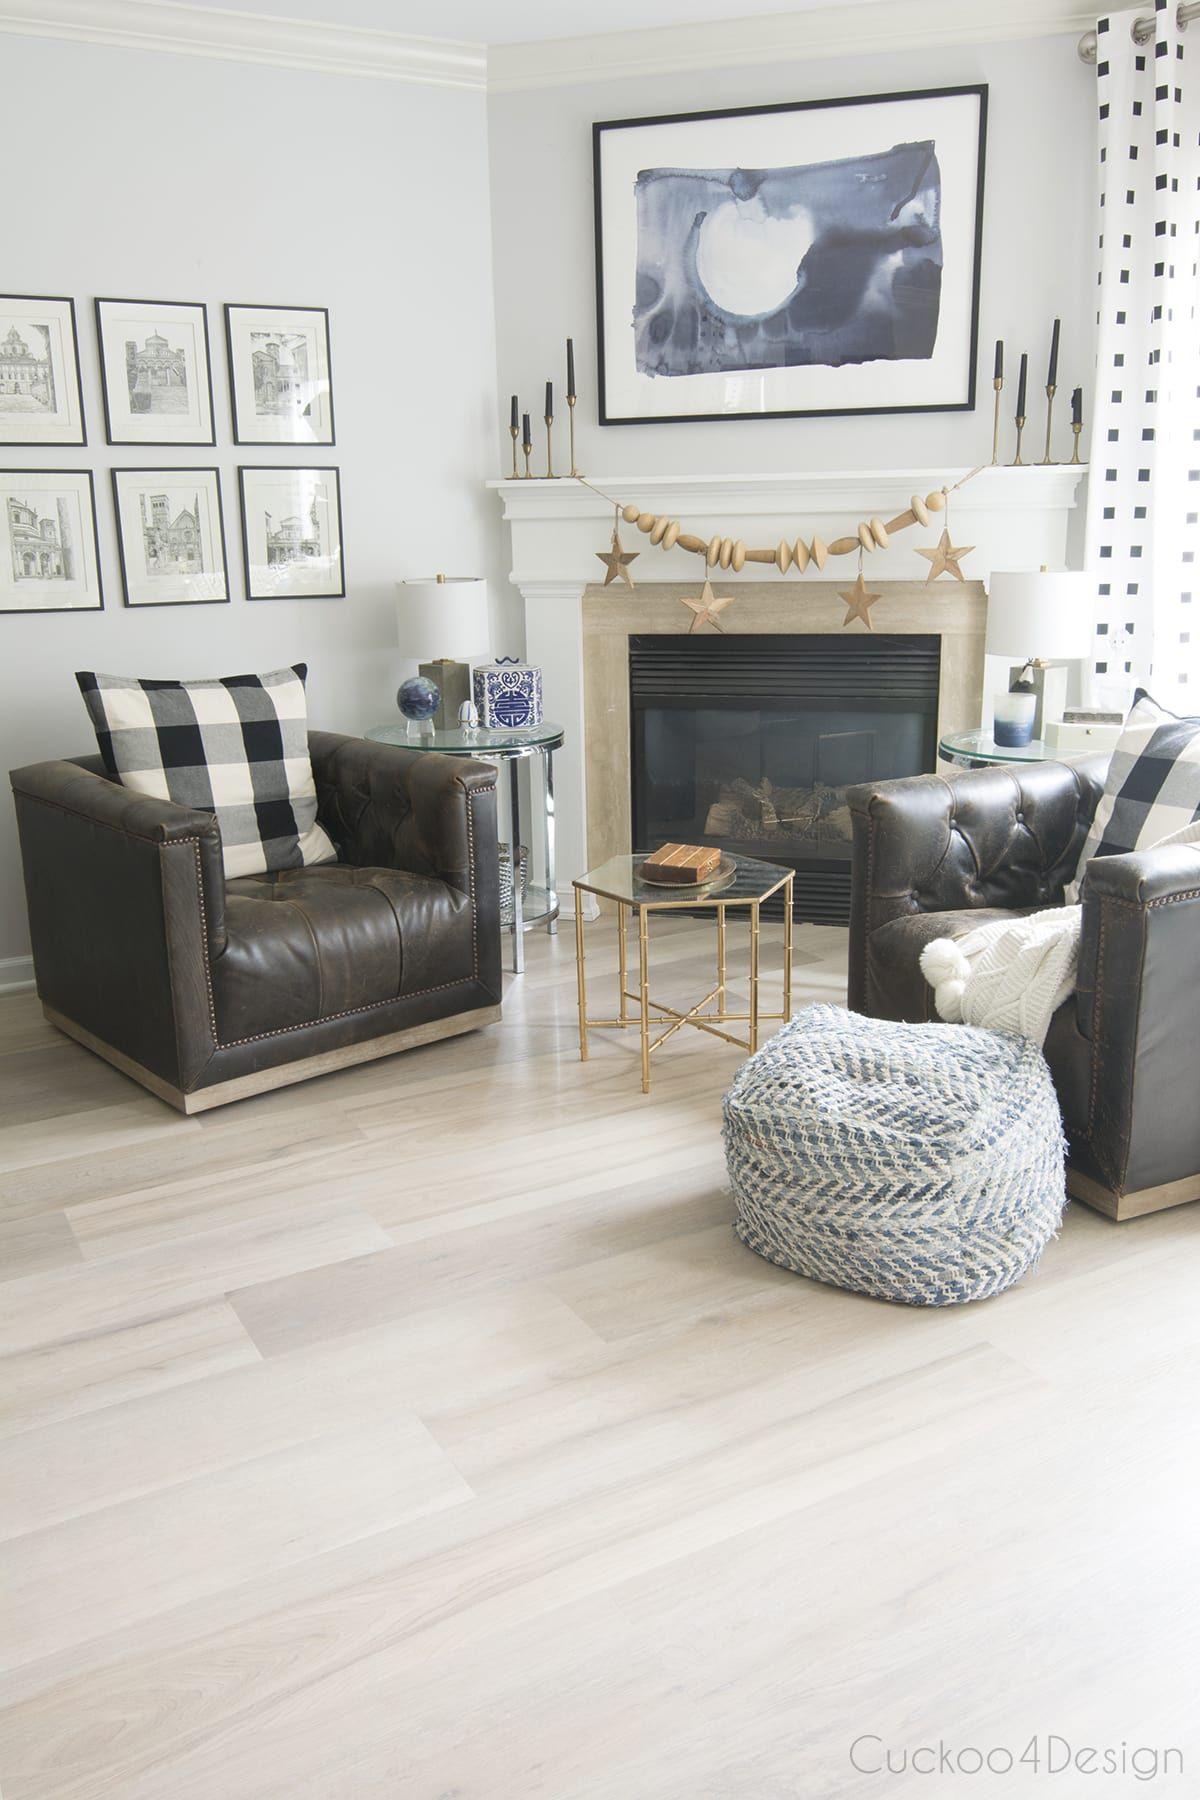 Why I Chose Karndean Vinyl Wood Plank Flooring Cuckoo4design Vinyl Wood Planks Vinyl Wood Flooring Luxury Vinyl Plank Flooring